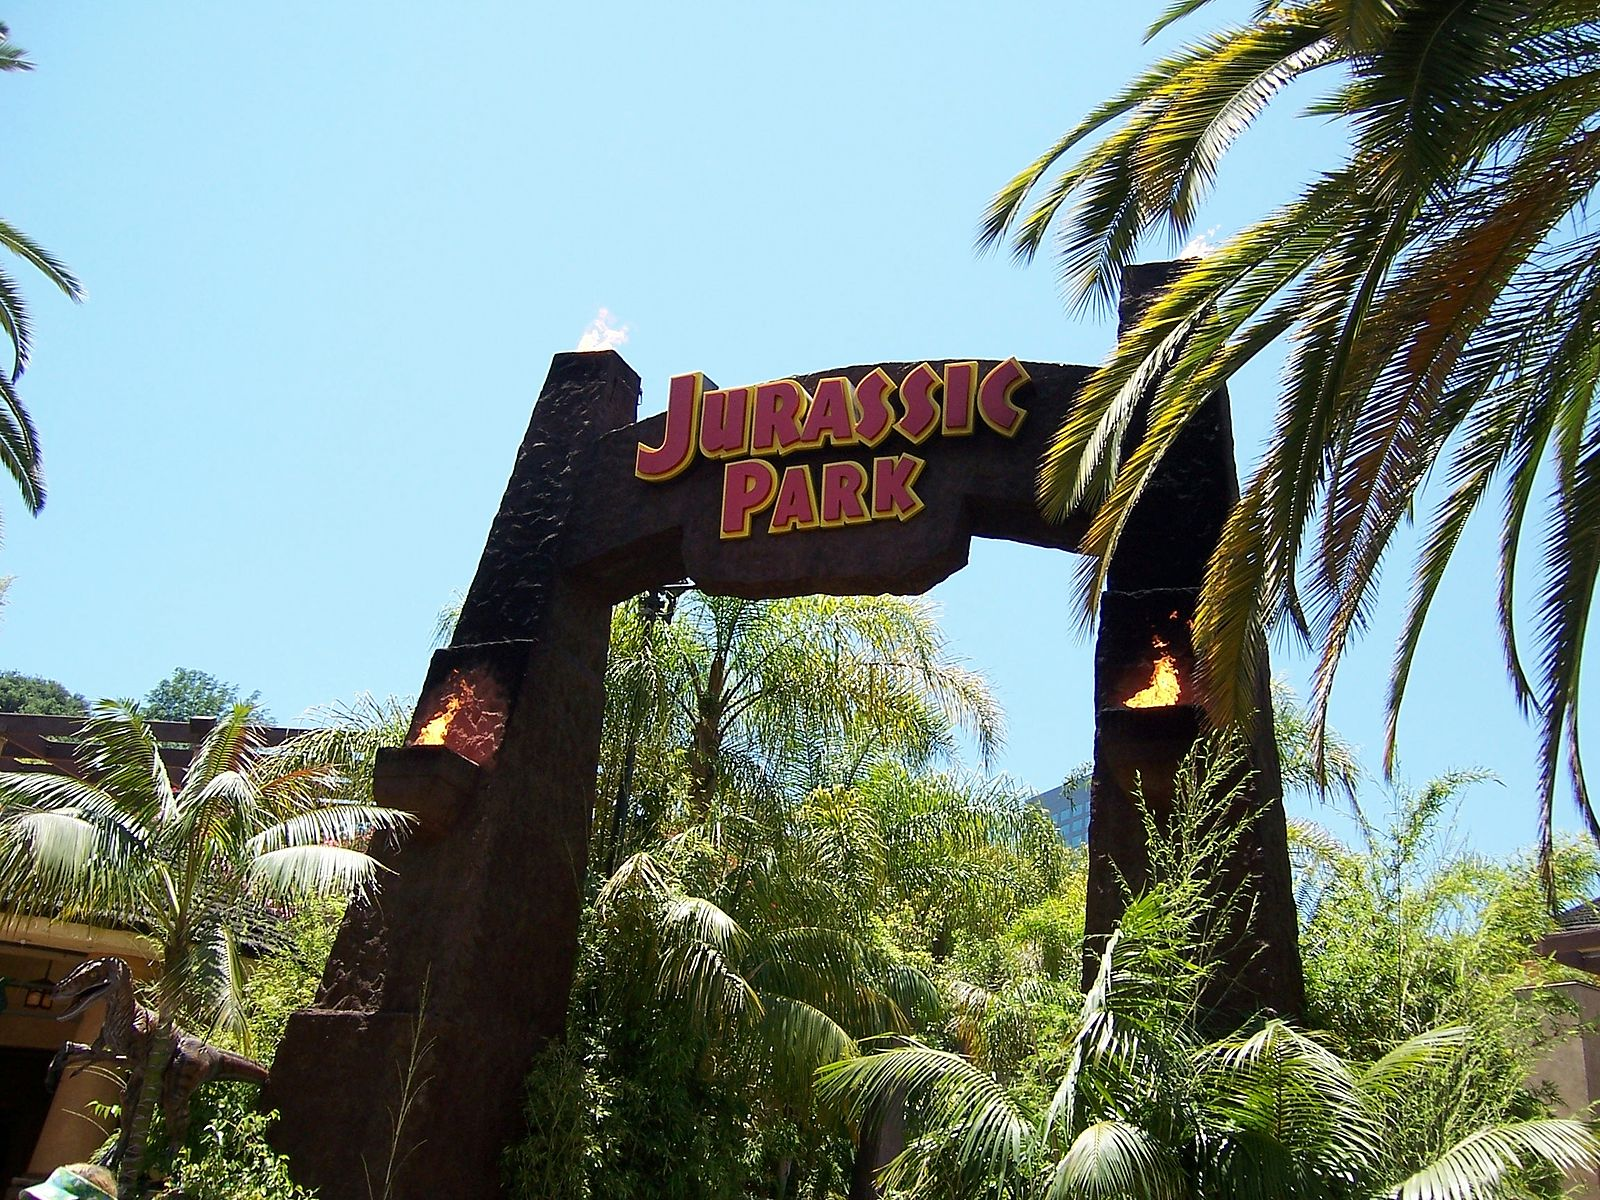 File:Jurassic Park, US.JPG